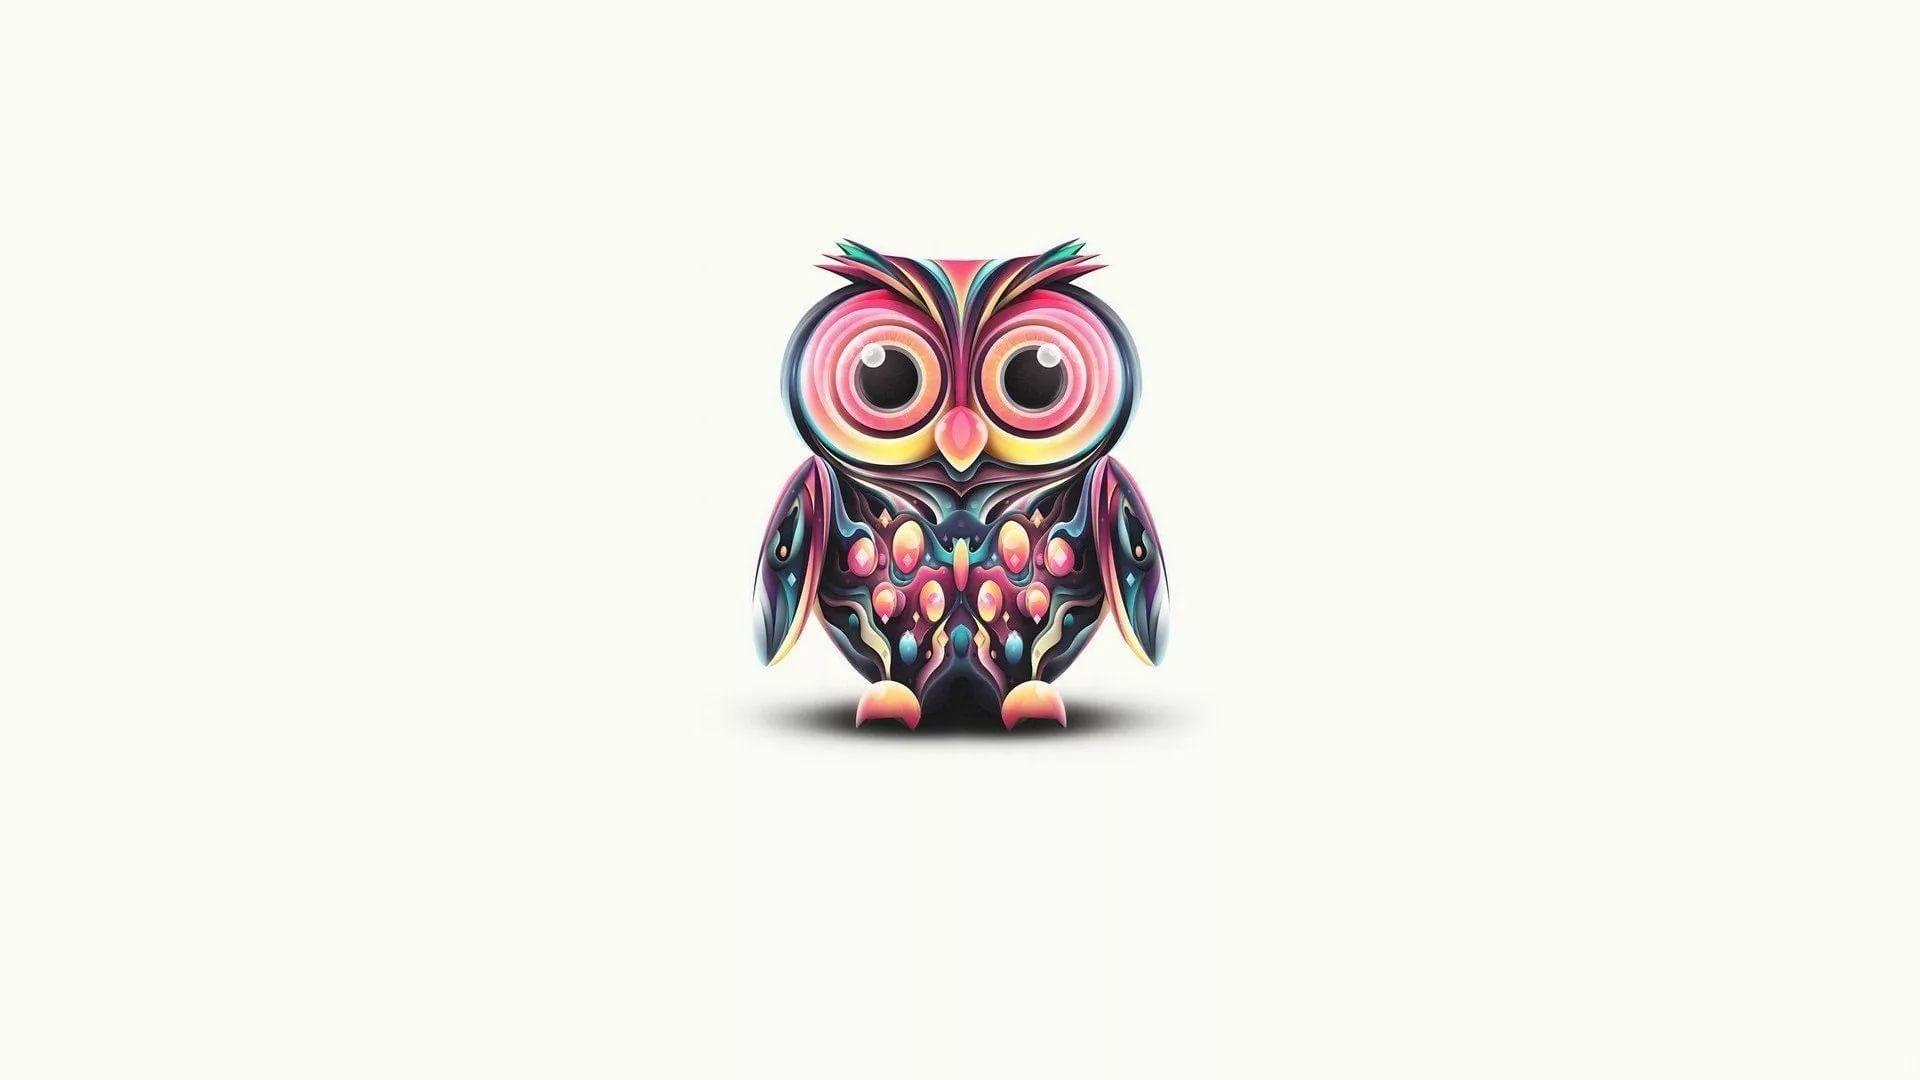 Cute Owl hd wallpaper download